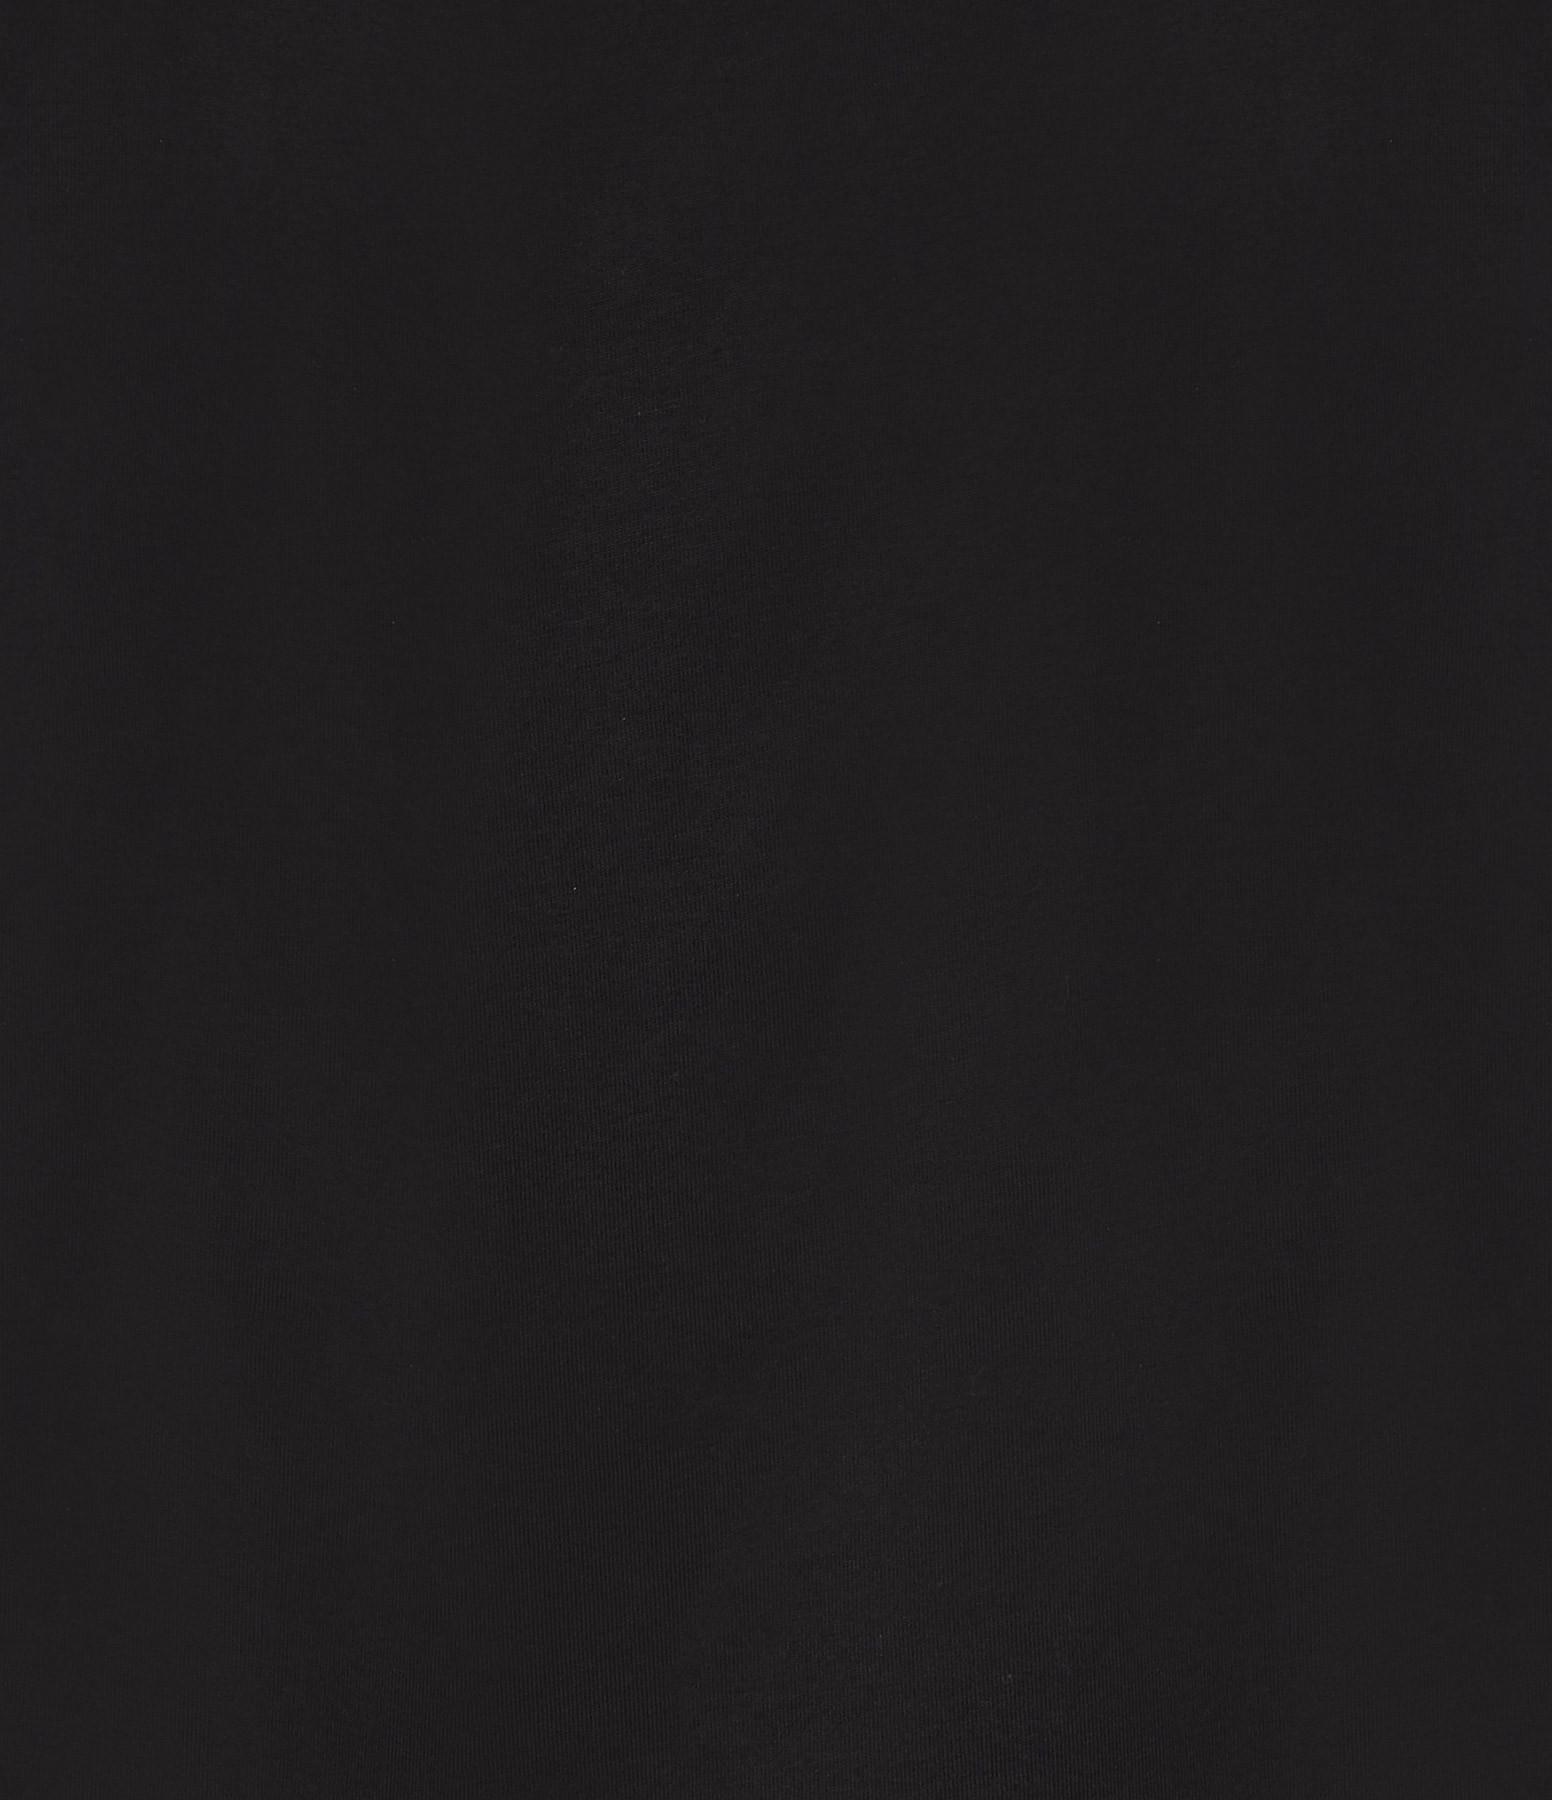 ISABEL MARANT - Tee-shirt Annax Coton Noir